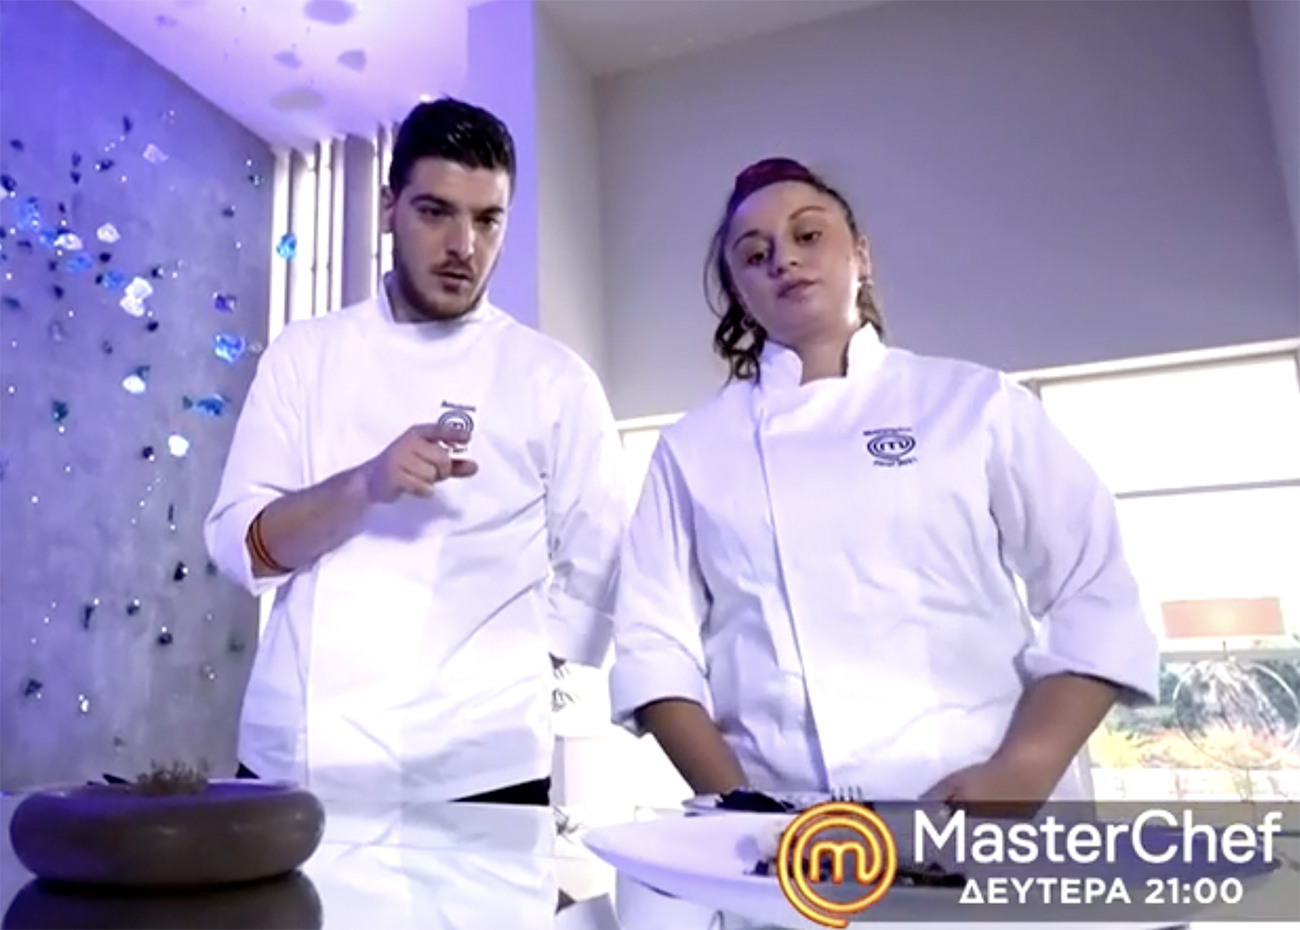 Masterchef 5 Τελικός: Η πιο δύσκολη μέρα της Μαργαρίτας – Όλα κρόινονται στις λεπτομέρειες